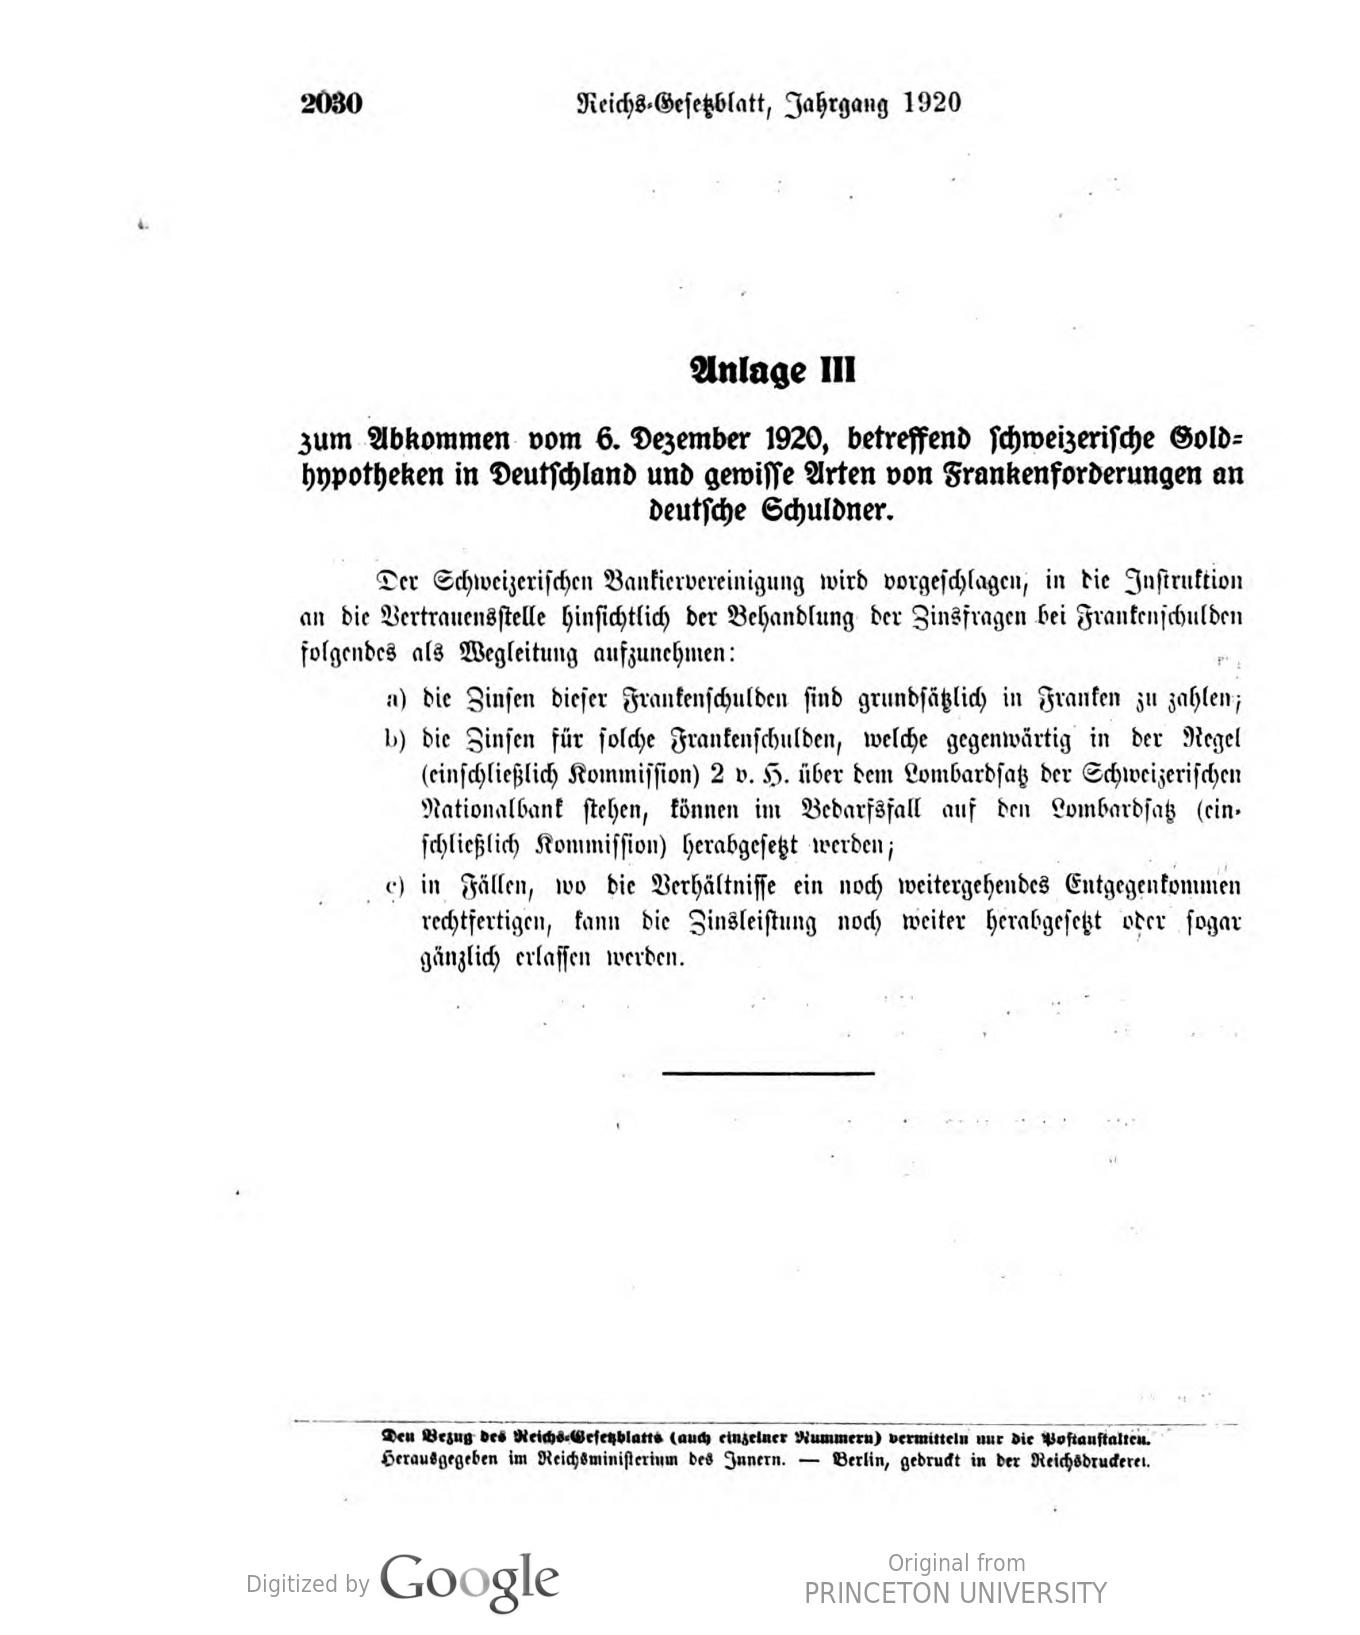 Fein Hypothekarzinsen Abzug Arbeitsblatt Galerie - Mathe ...